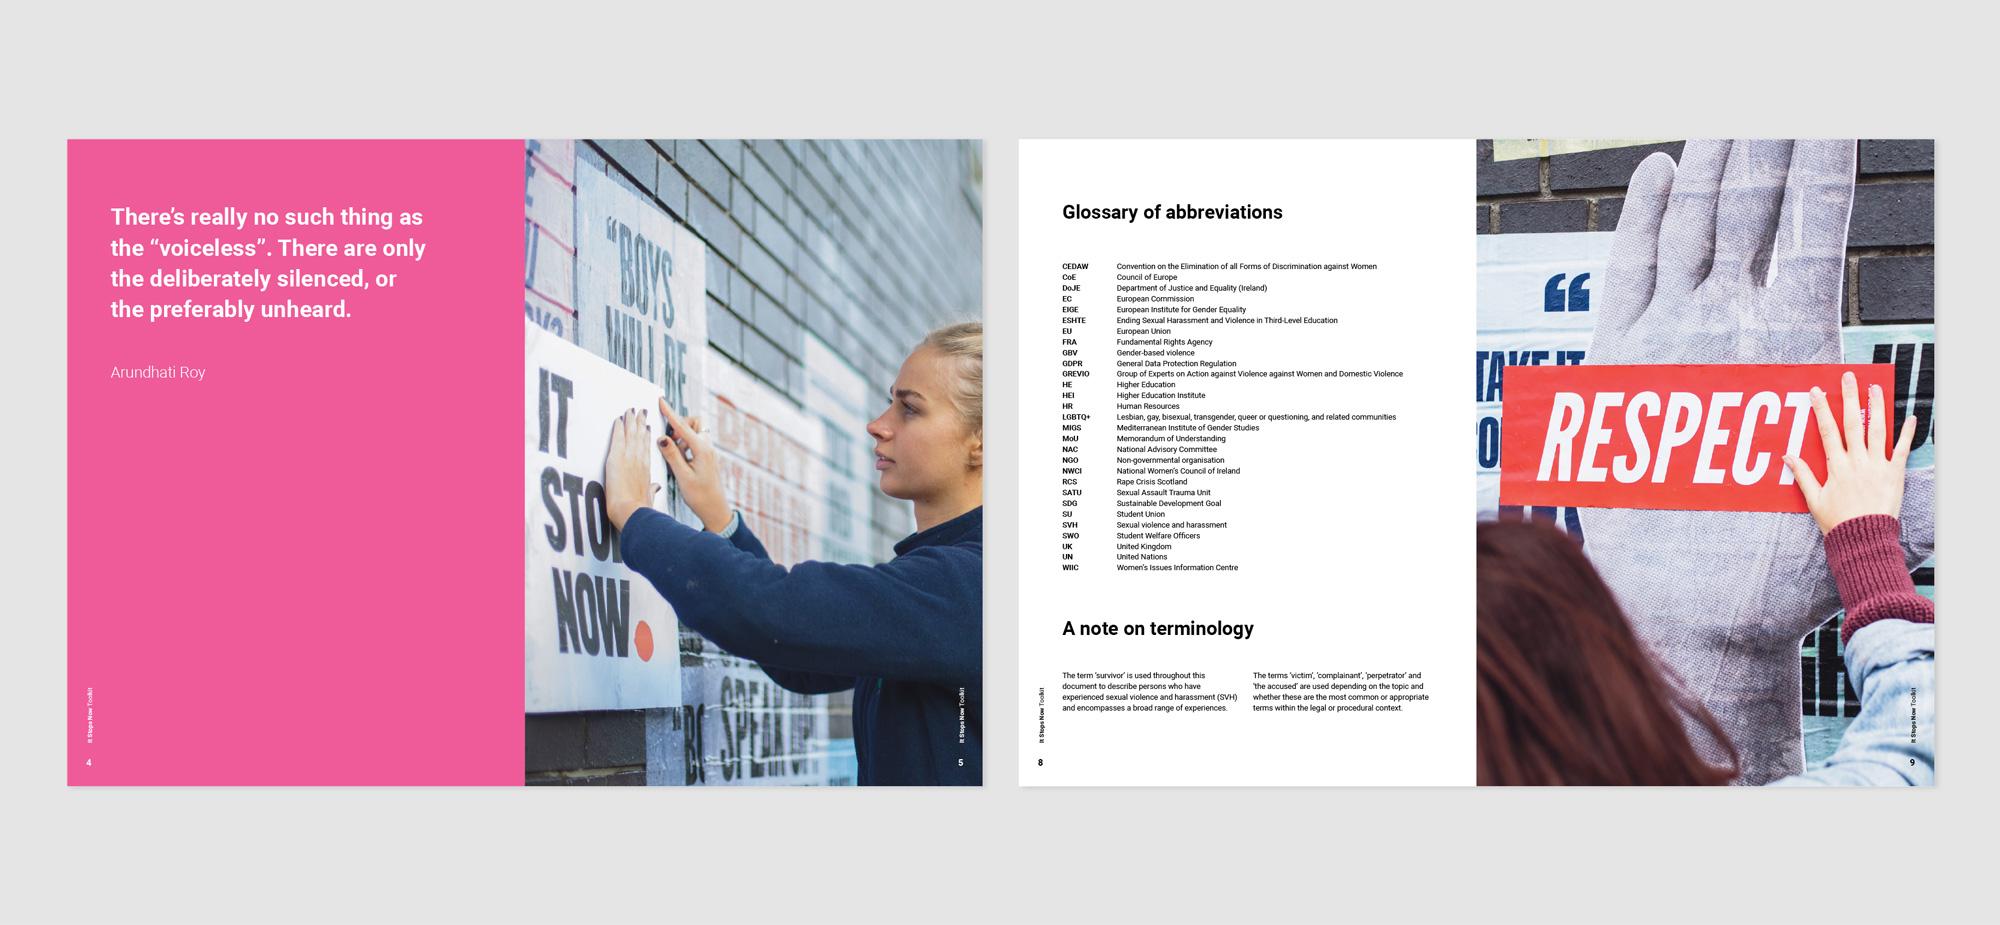 ItStopsNow-campaign-toolkit-2